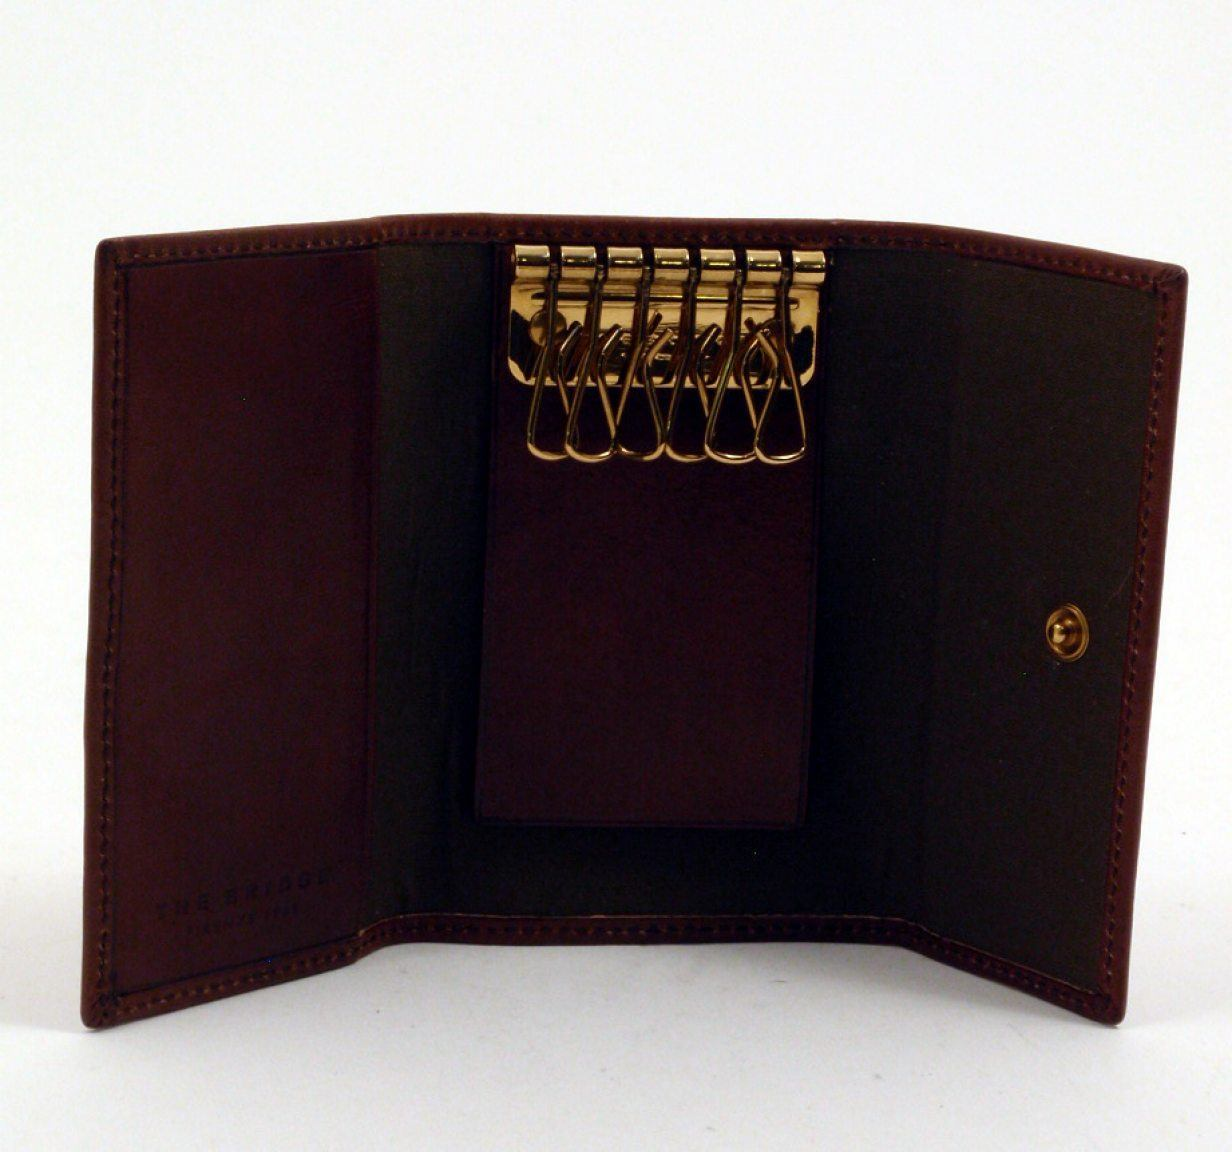 Schlüsseletui mit Karabiner The Bridge Leder marrone